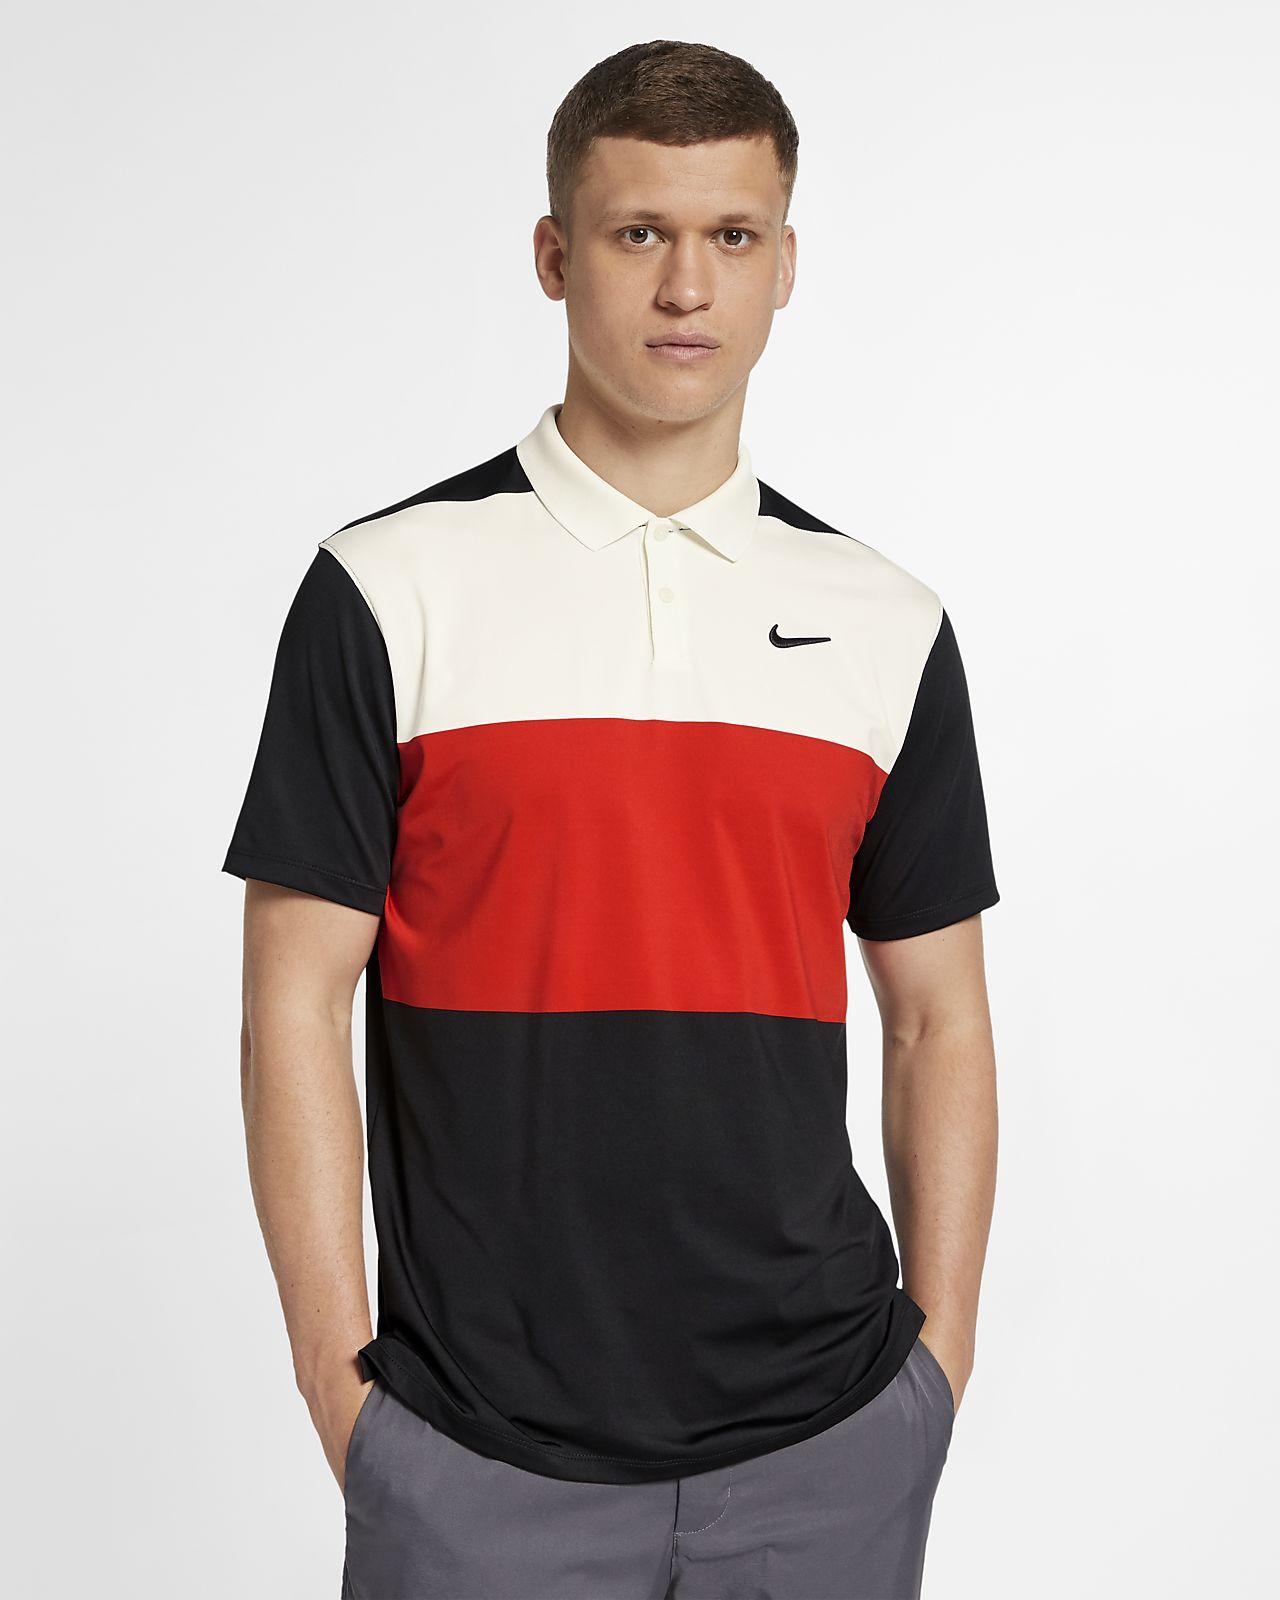 15d3d7de3f Nike Dri-FIT Vapor Men's Golf Polo. Nike.com